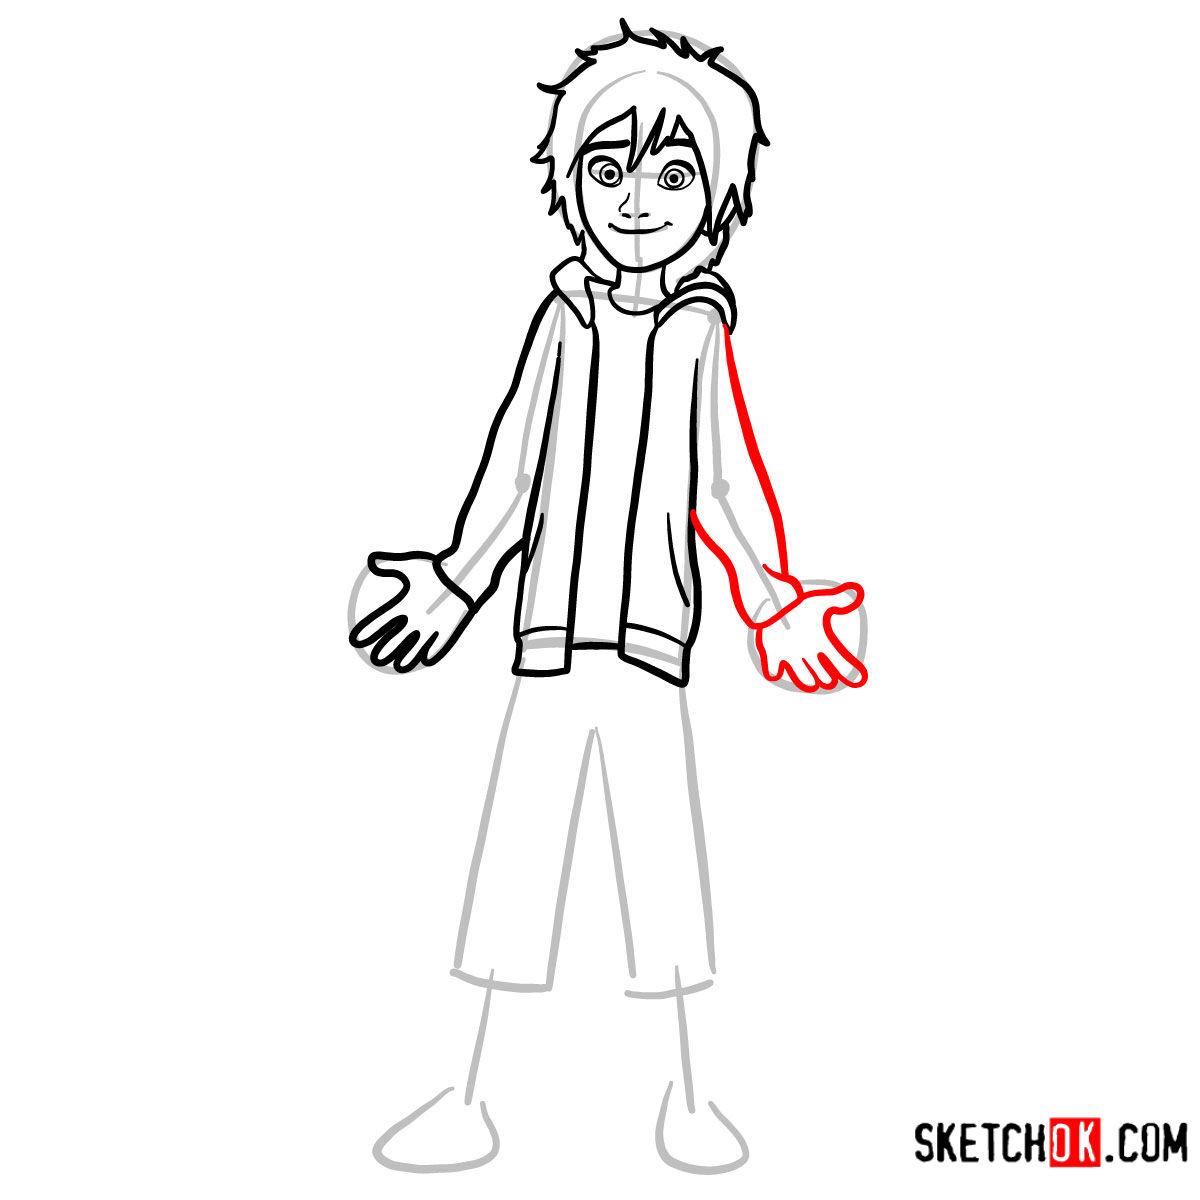 How to draw Hiro Hamada | Big Hero 6 - step 07